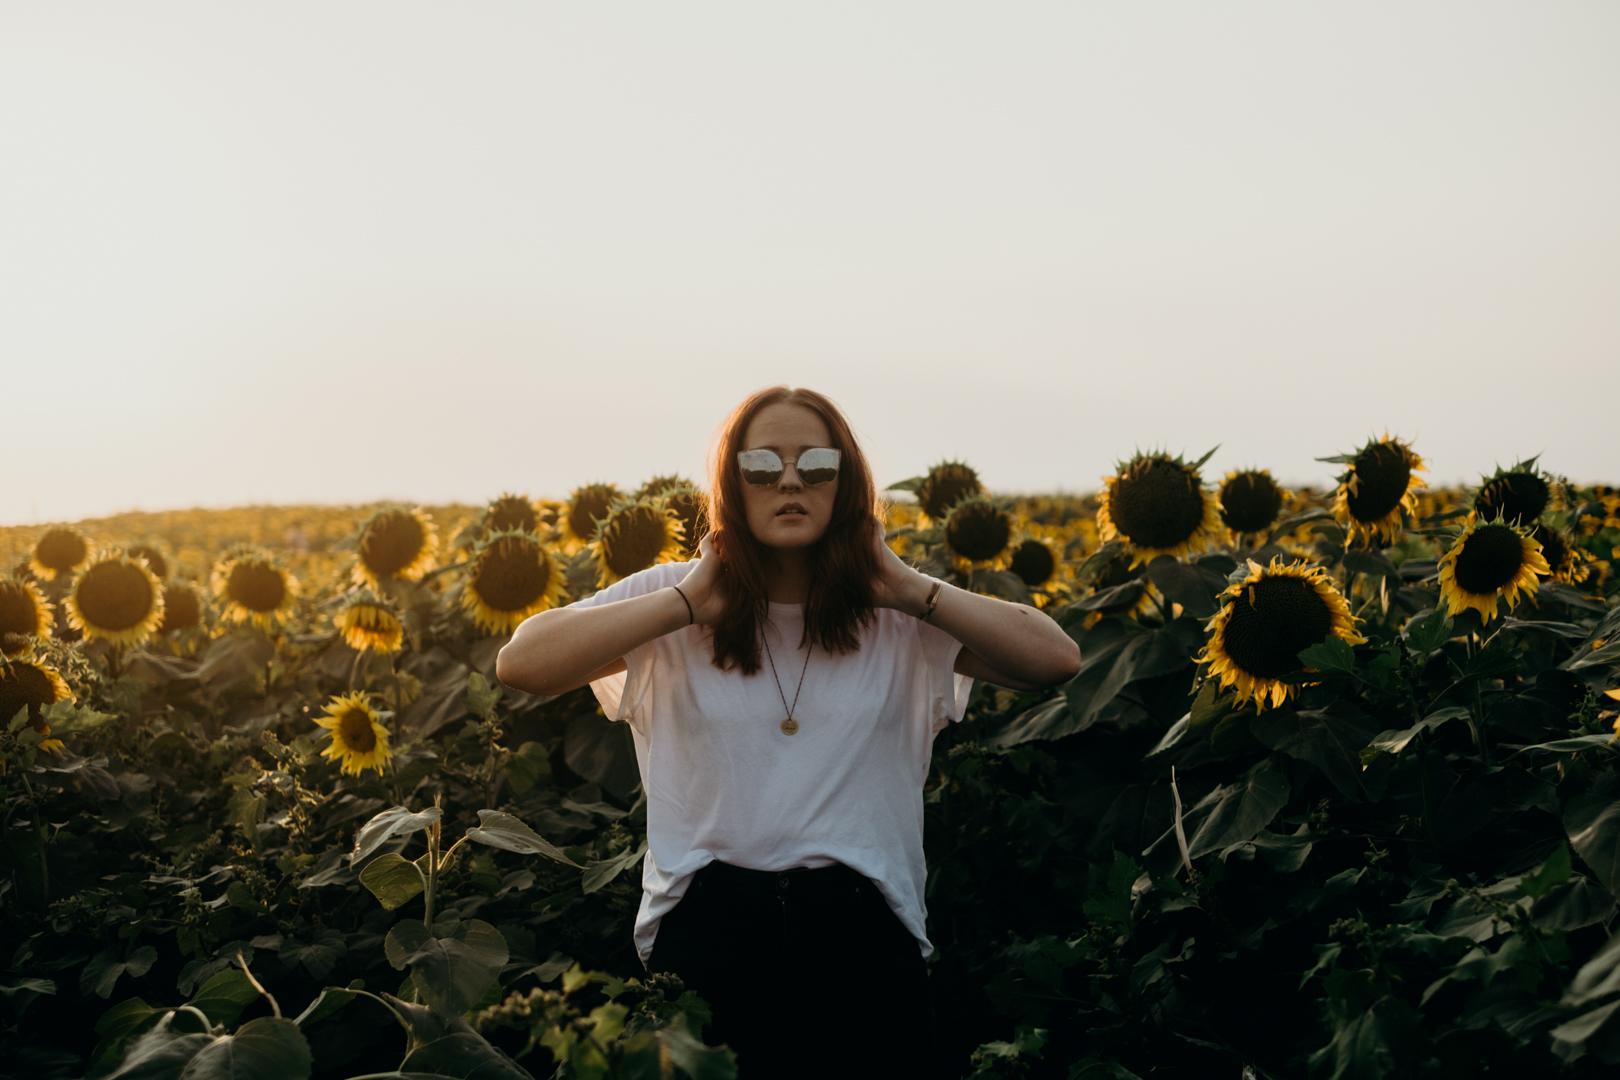 20170909_Grinters Farms Sunflower Fields Lawrence Kansas__16.jpg